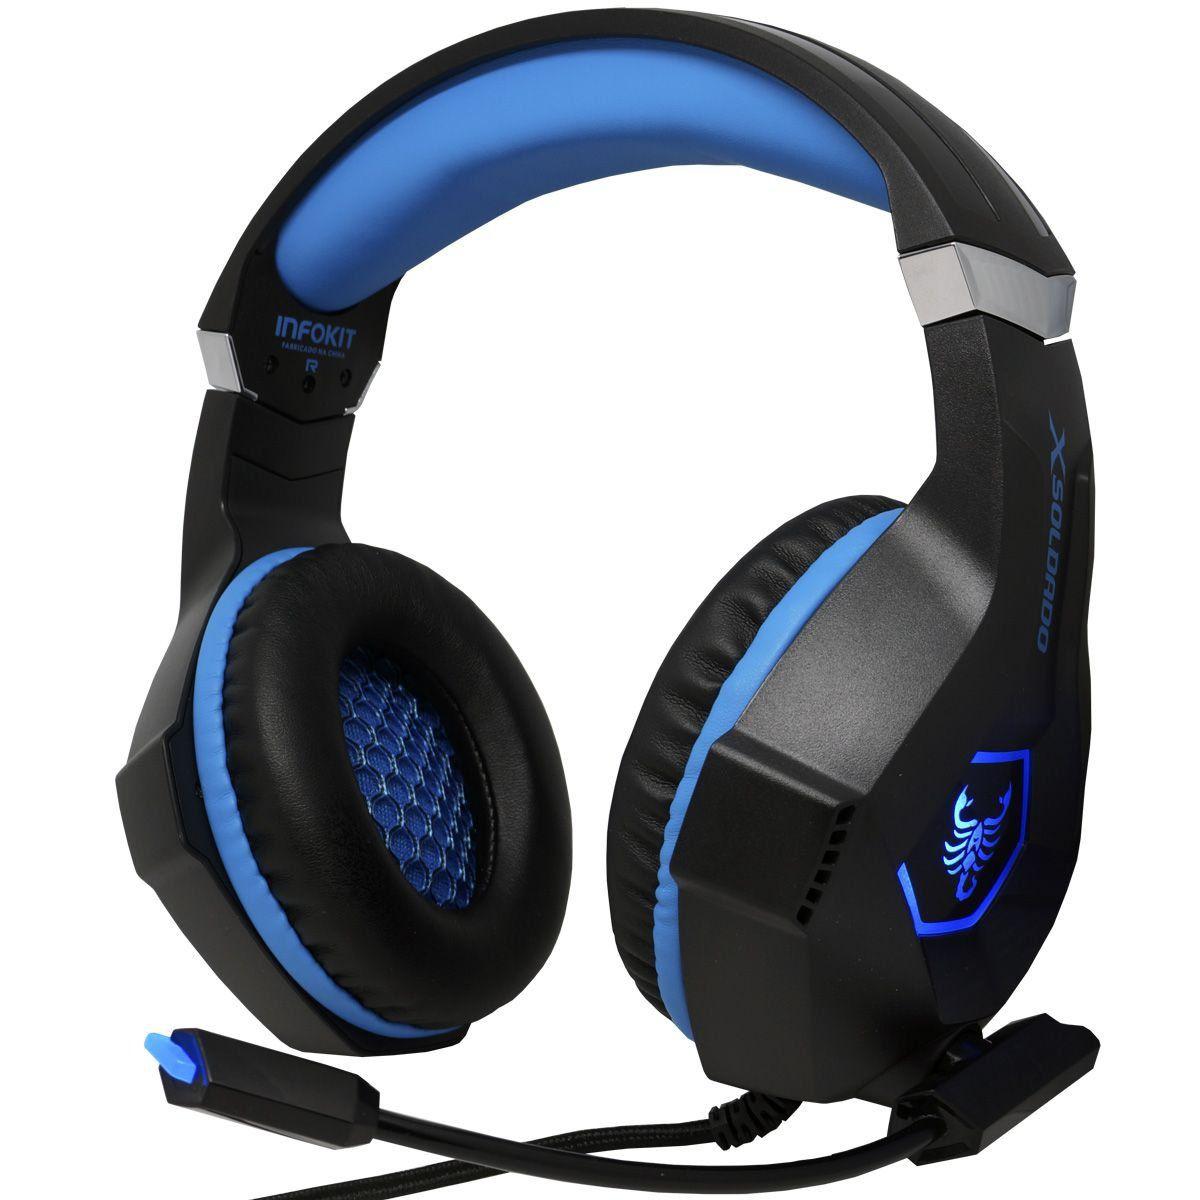 Headphone Gamer Scorpion bass AZUL PS4/PC/SMARTPHONE microfone articulado LED RGB INFOKIT GH-X1000